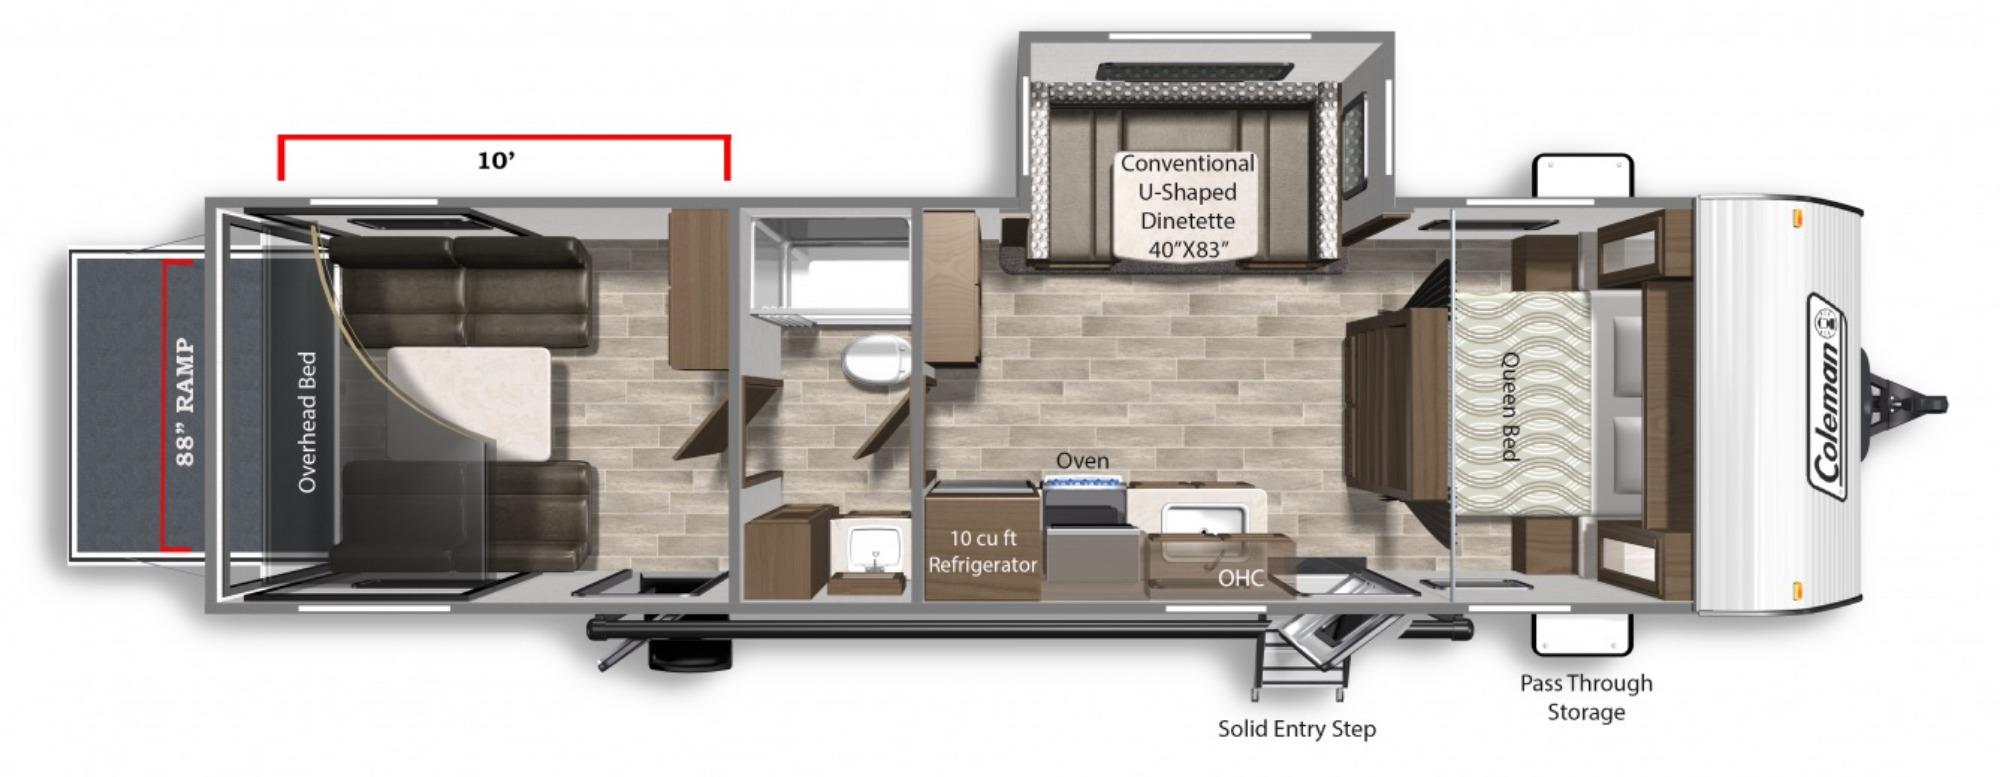 View Floor Plan for 2022 COLEMAN COLEMAN LANTERN 300TQ